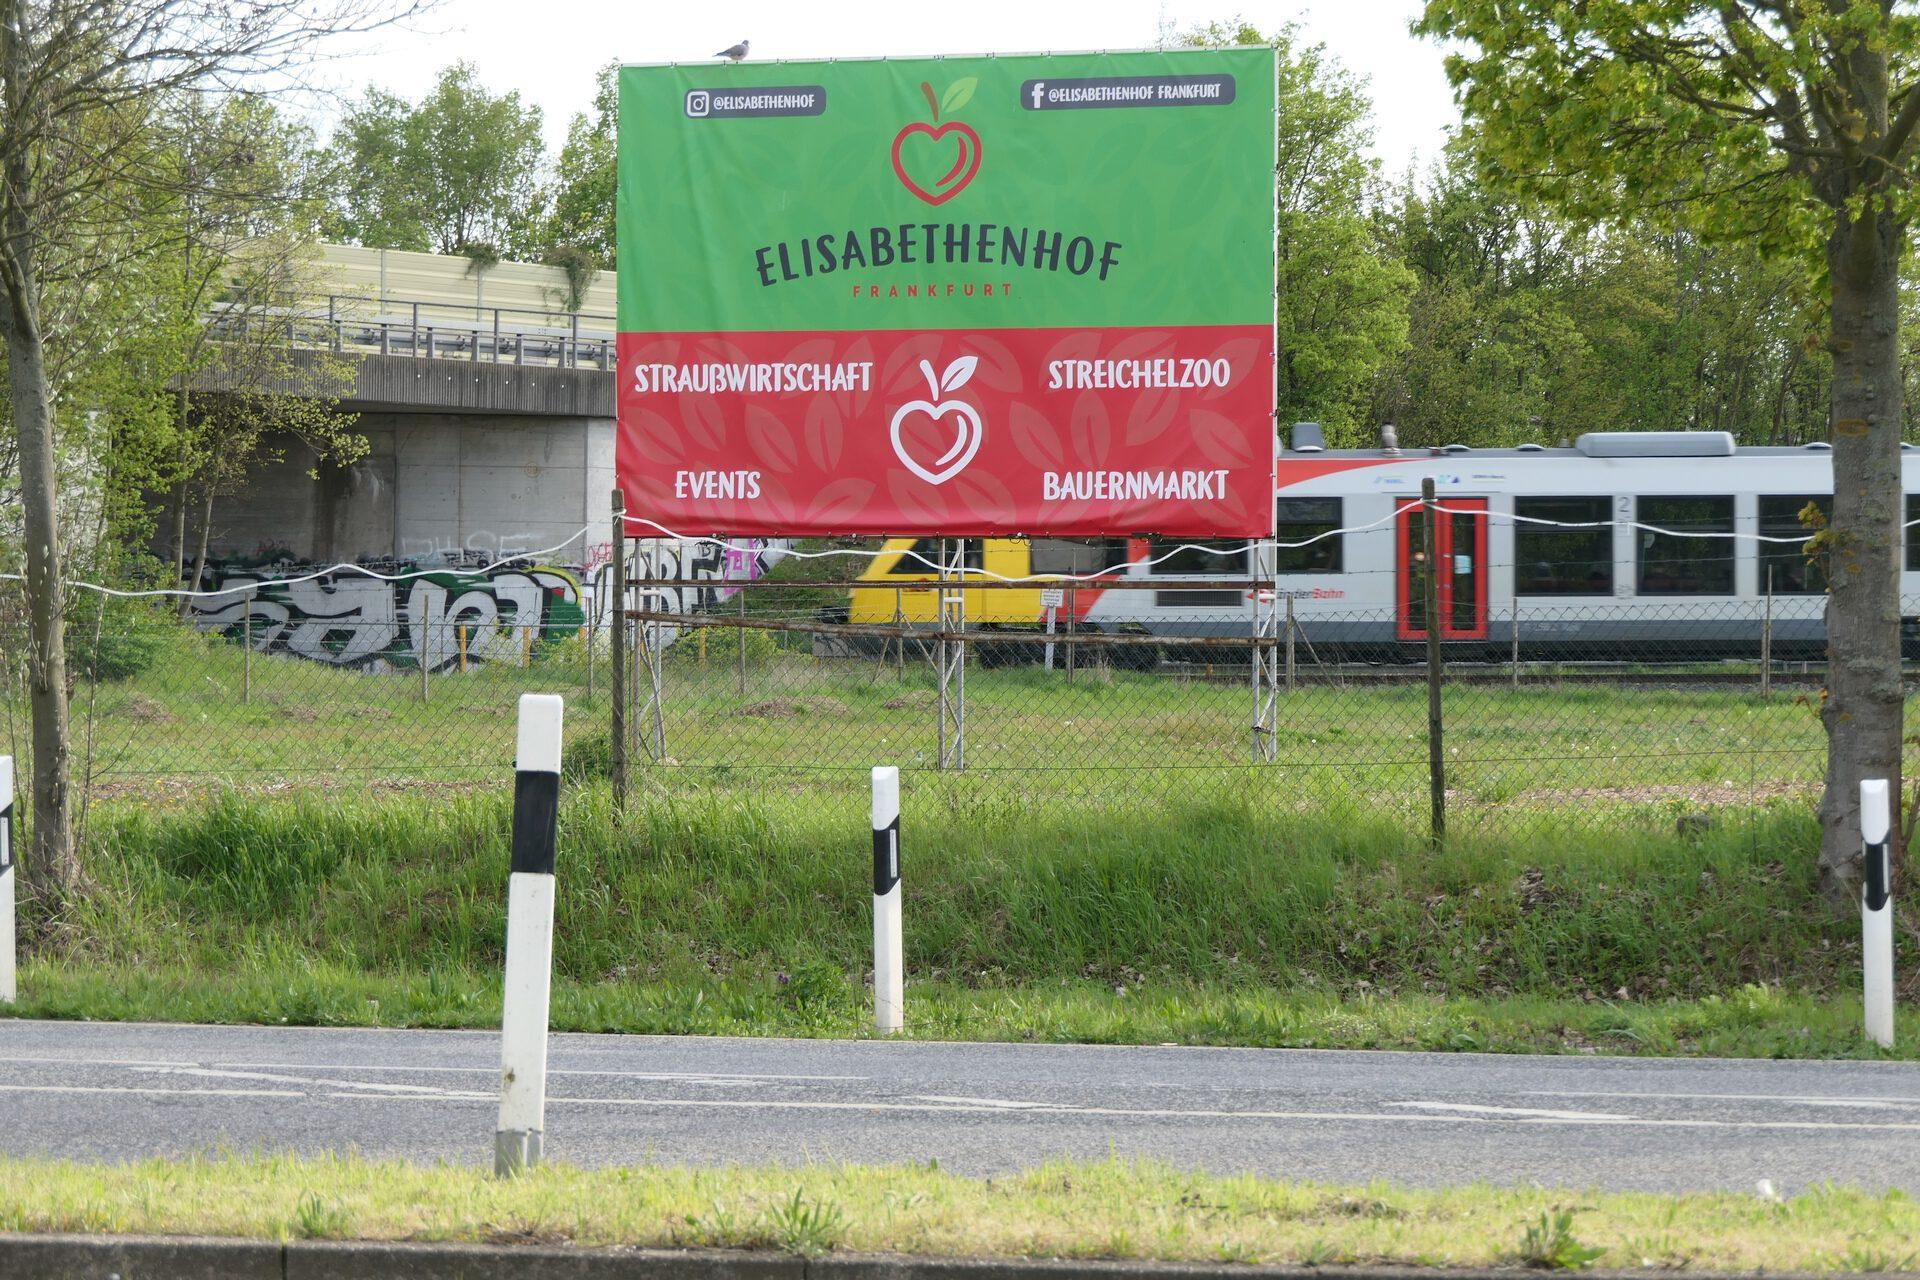 Werbetafel Elisabethenhof Frankfurt